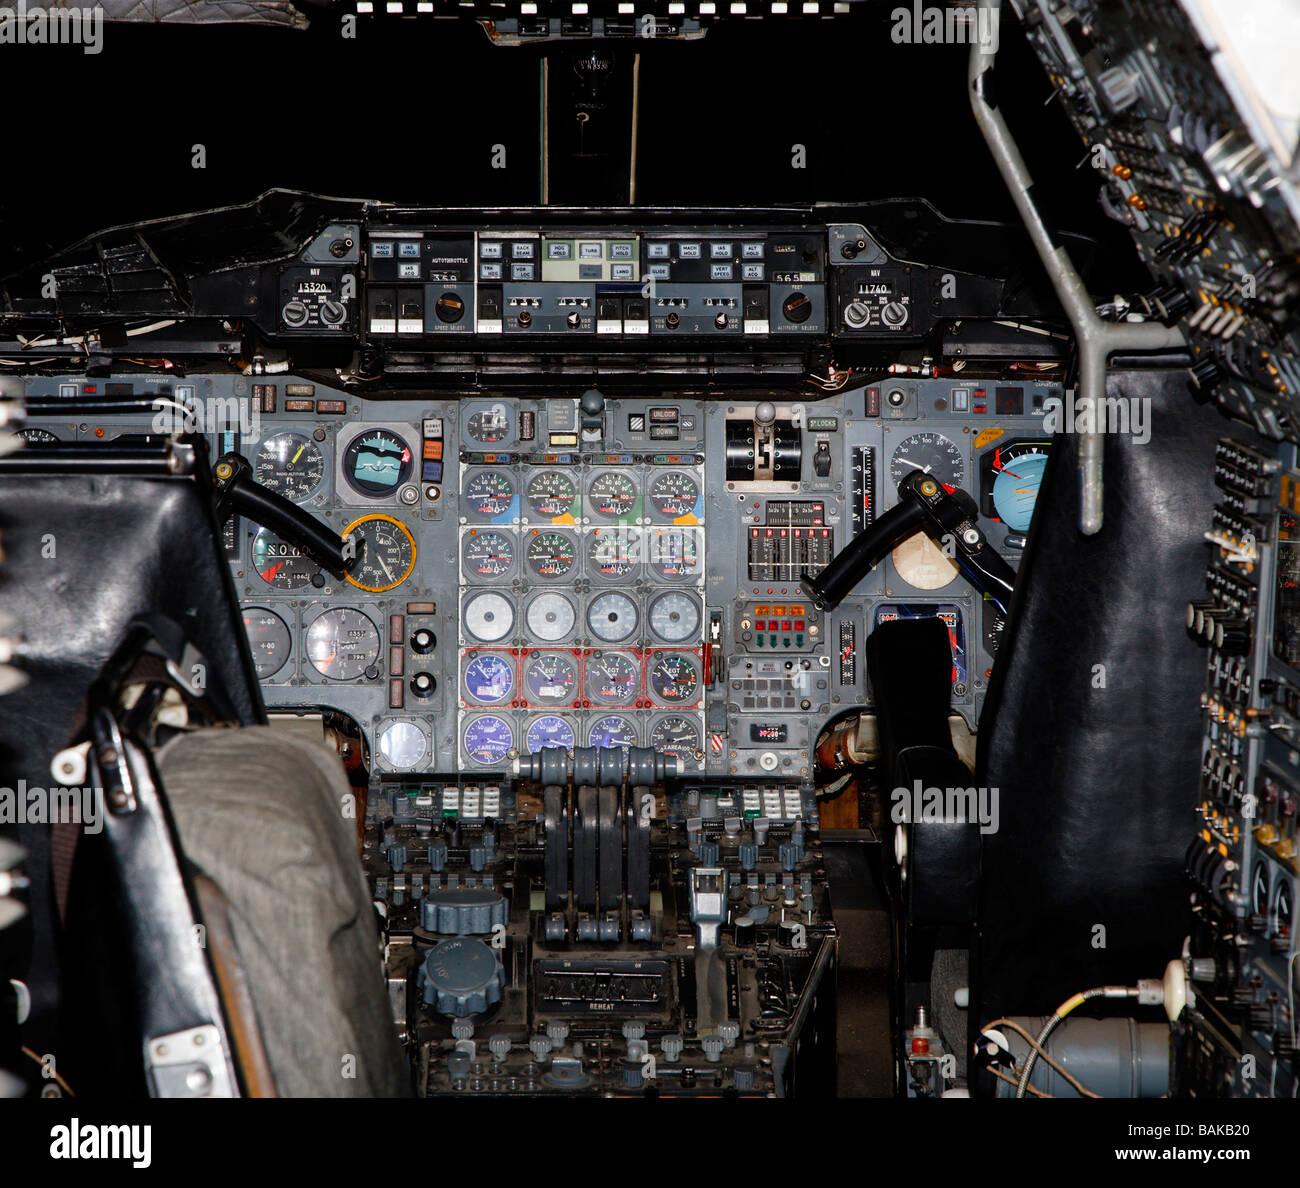 Concorde cockpit flight deck control panel Stock Photo